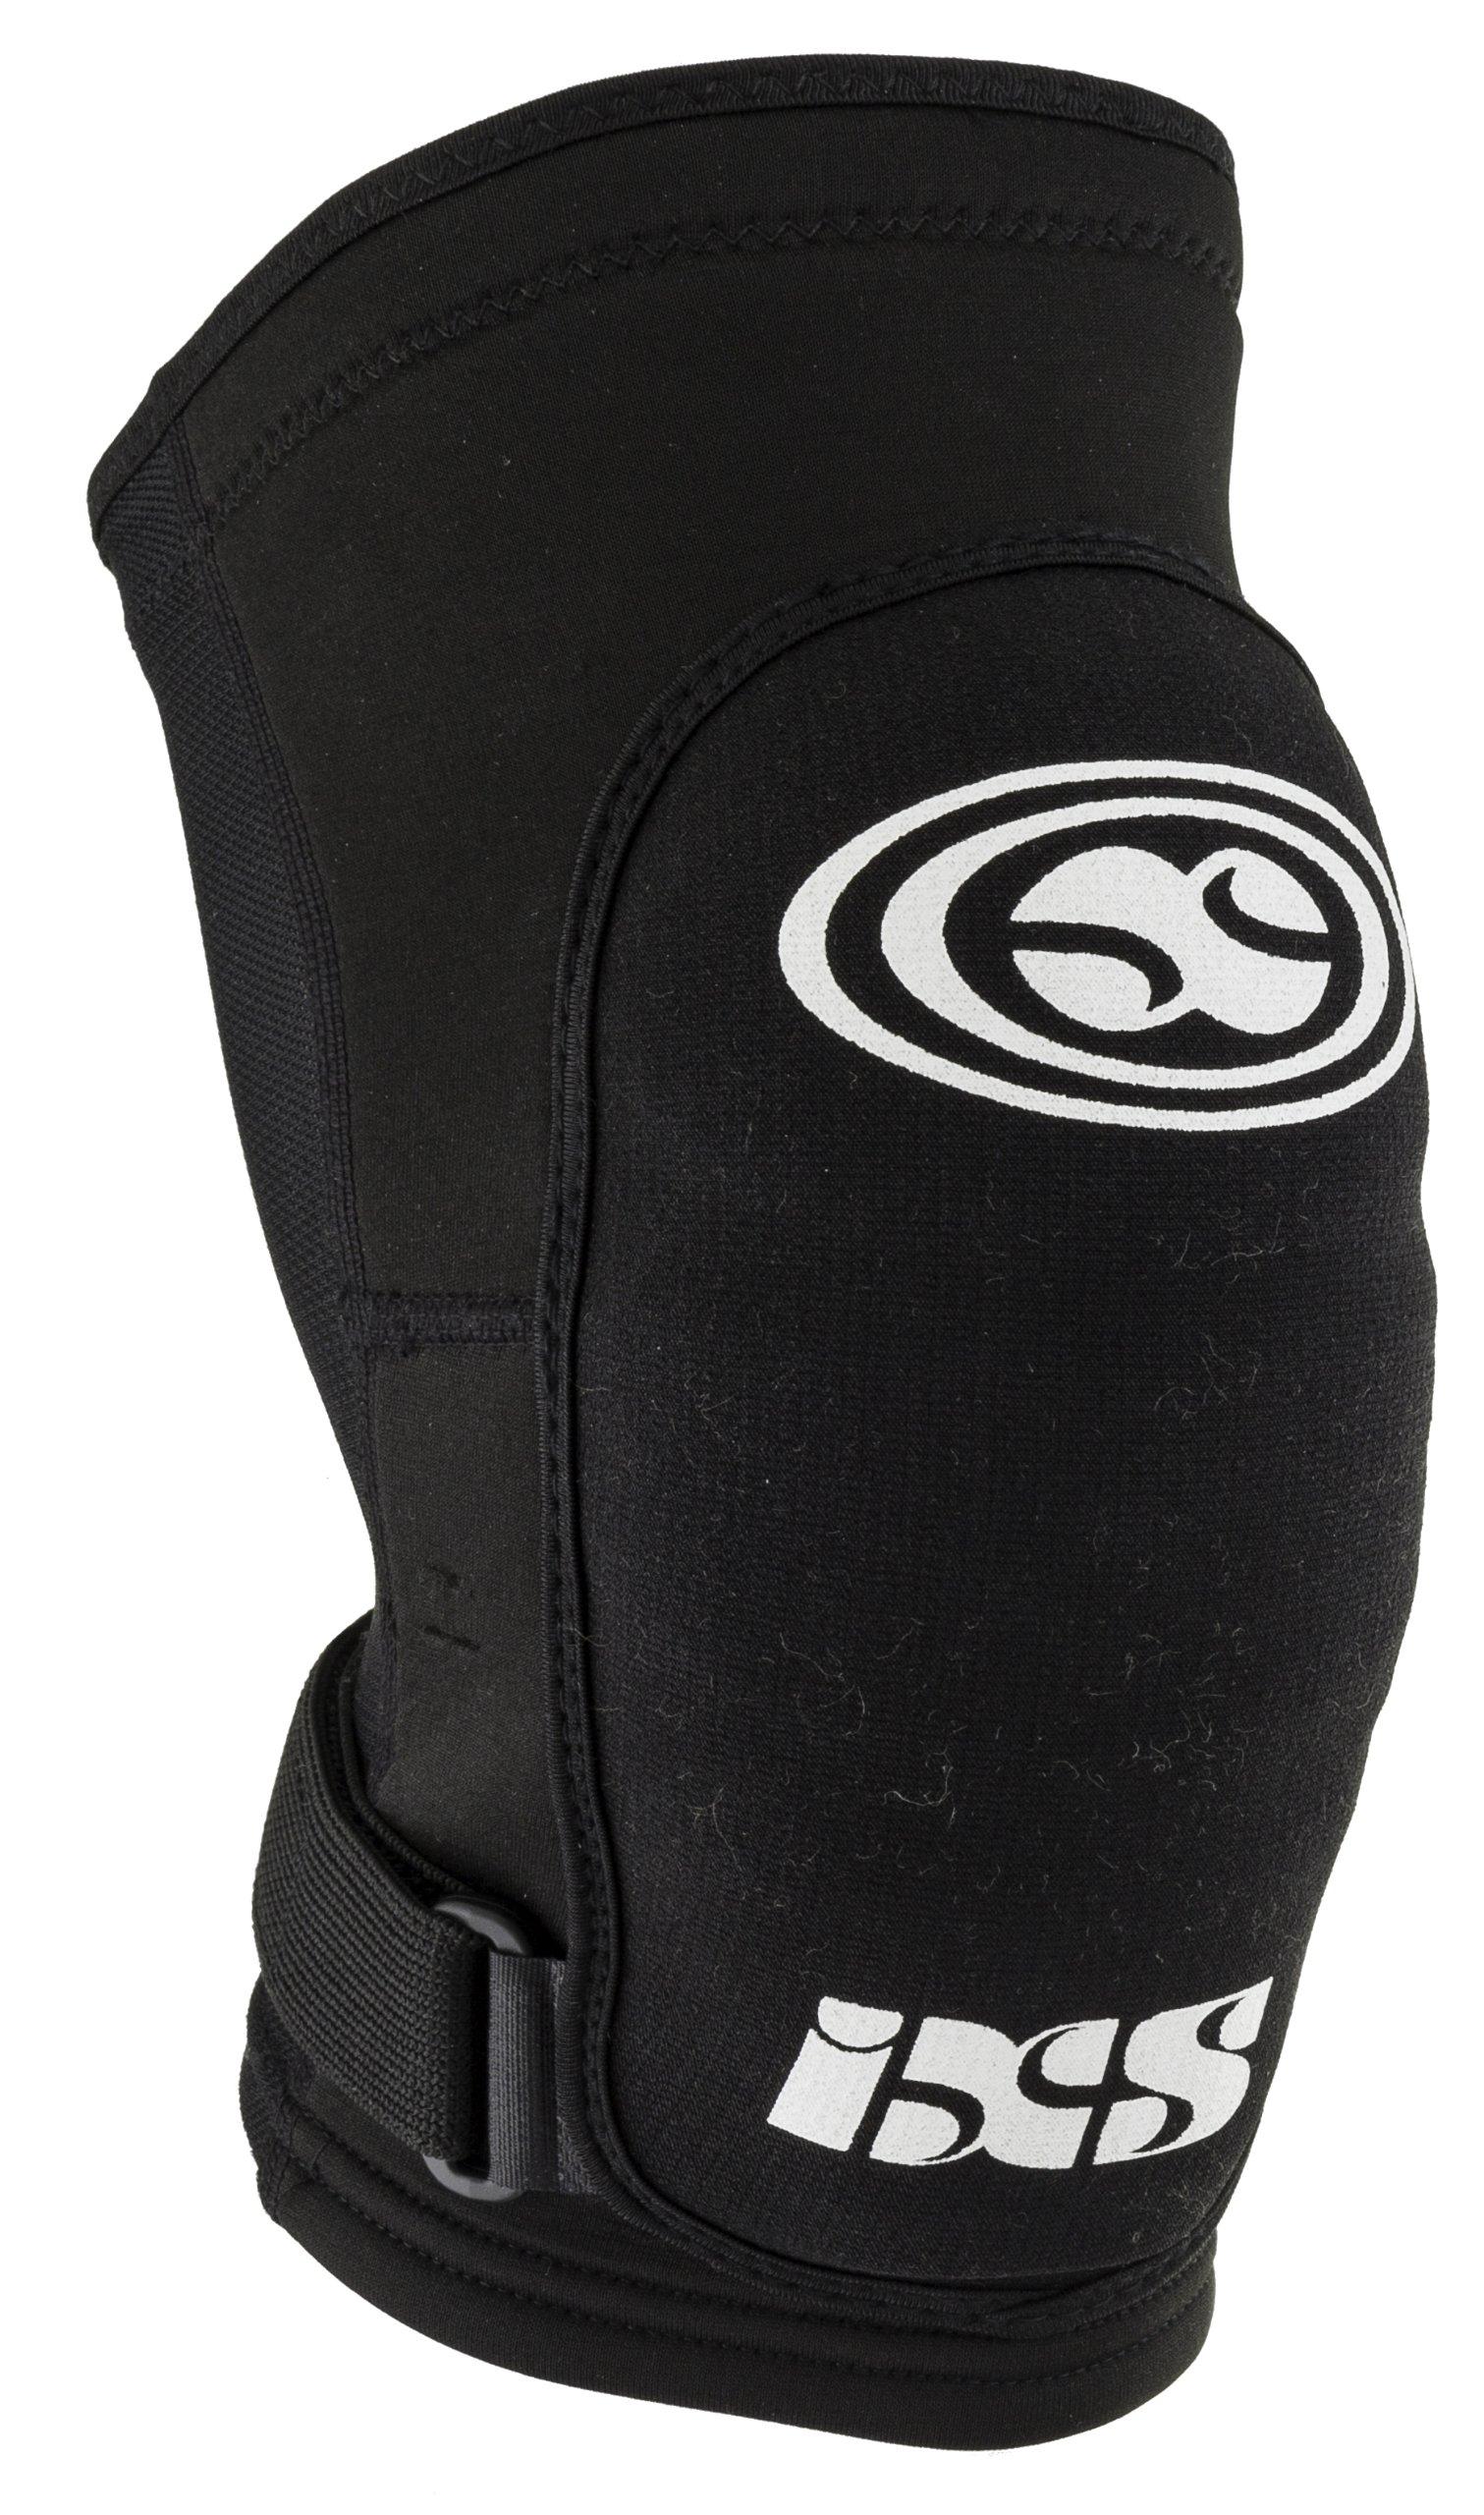 IXS Flow soft black (Size: L) leg protector